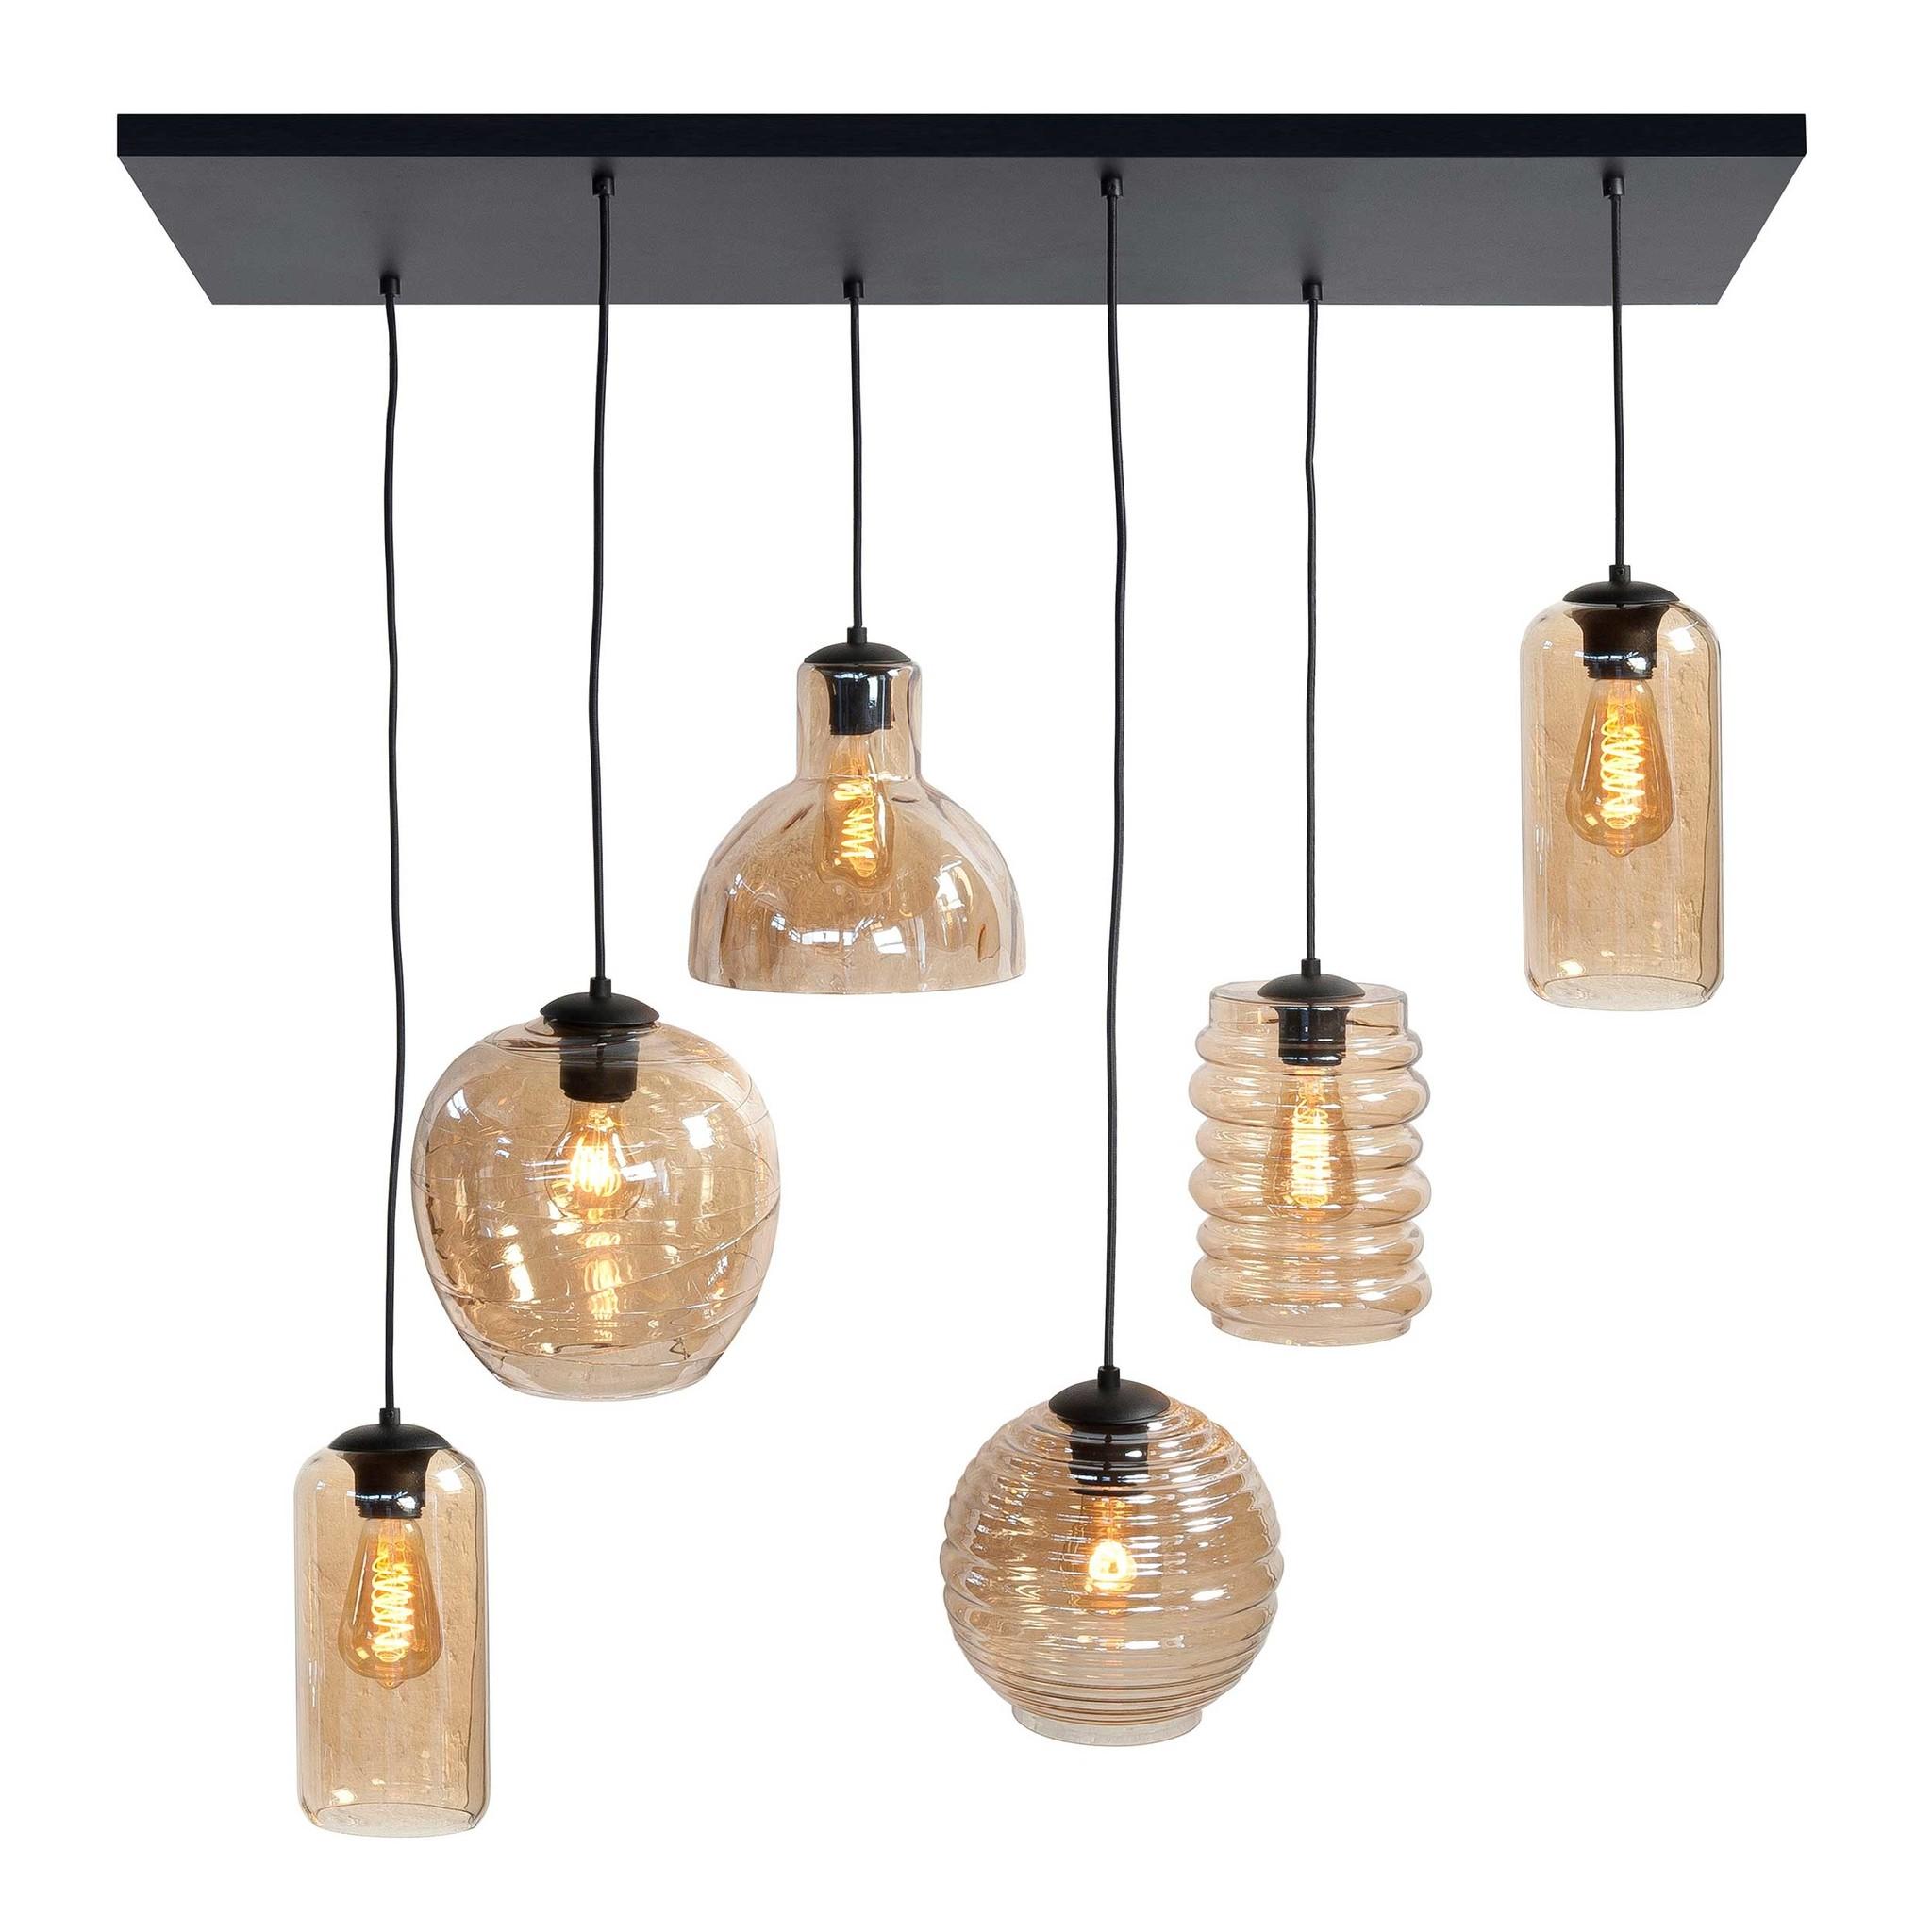 Highlight Hanglamp Fantasy 6 lichts L 100 x B 35 cm amber glas